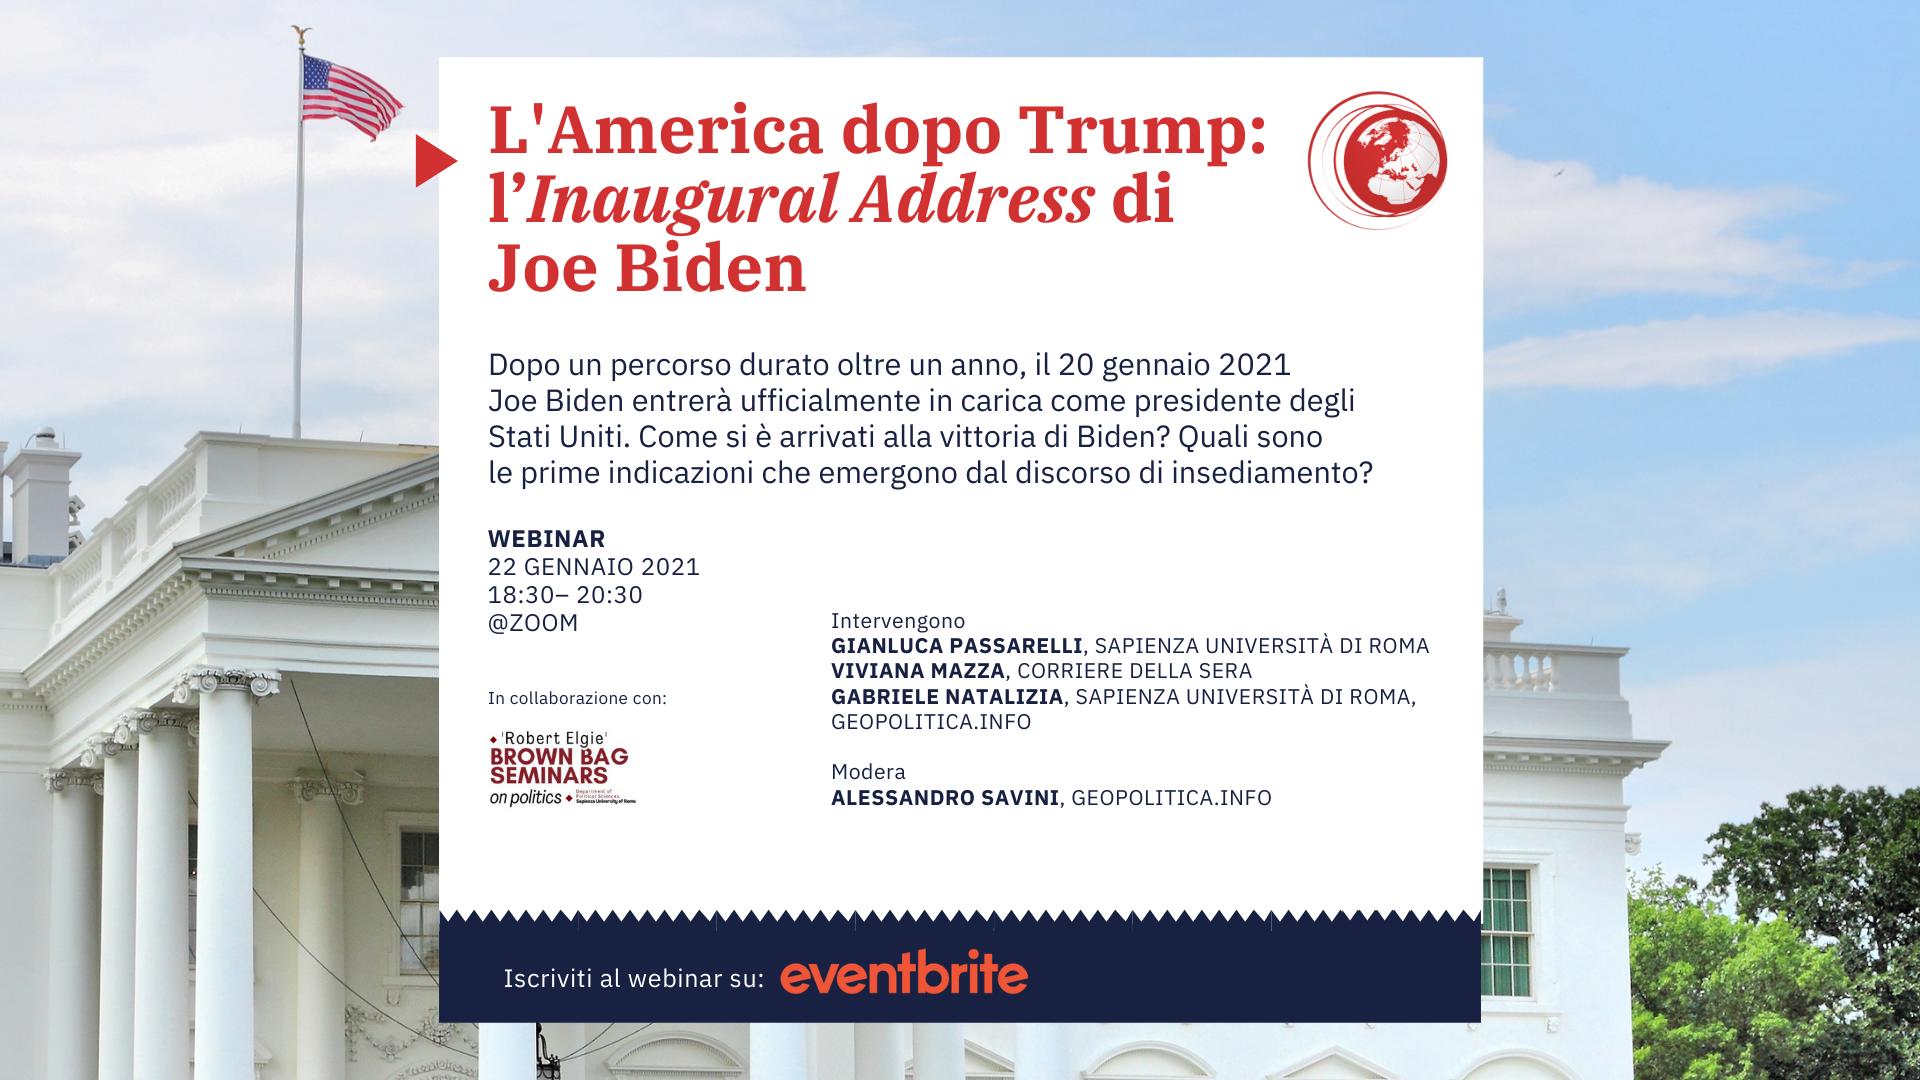 L'America dopo Trump:  l'Inaugural Address di Joe Biden – 22 gennaio 2021, ore 18.30 – 20.30 – Webinar @zoom - Geopolitica.info